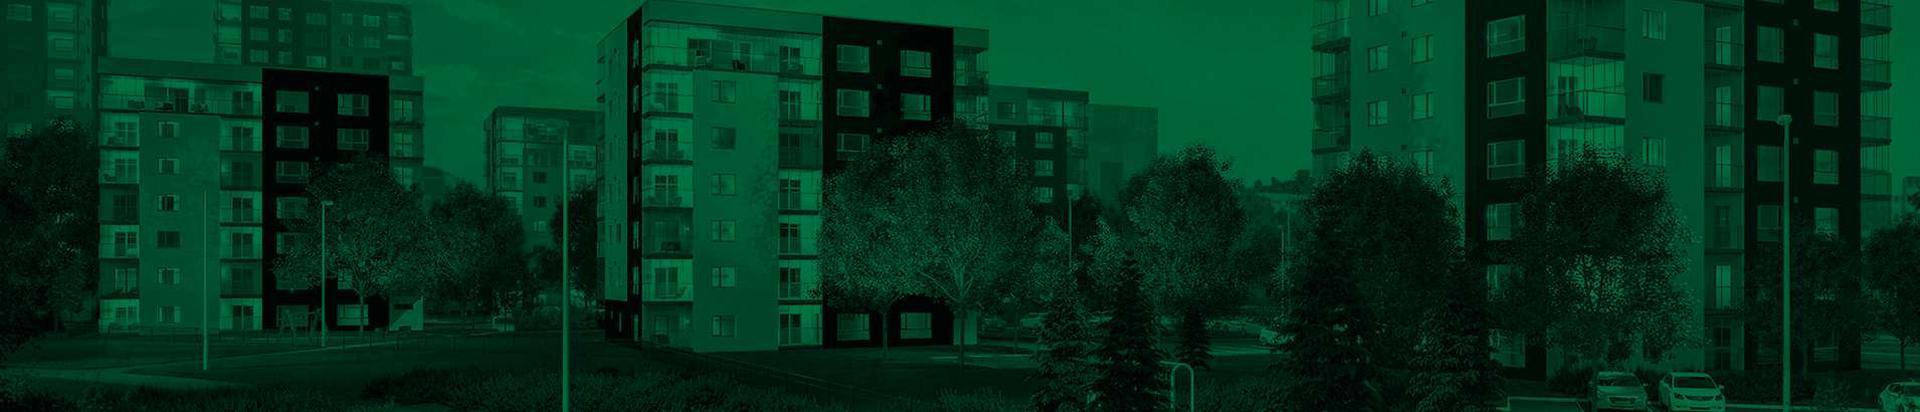 12203636_aktsiaselts-merko-ehitus-eesti_51840080_xl.jpg